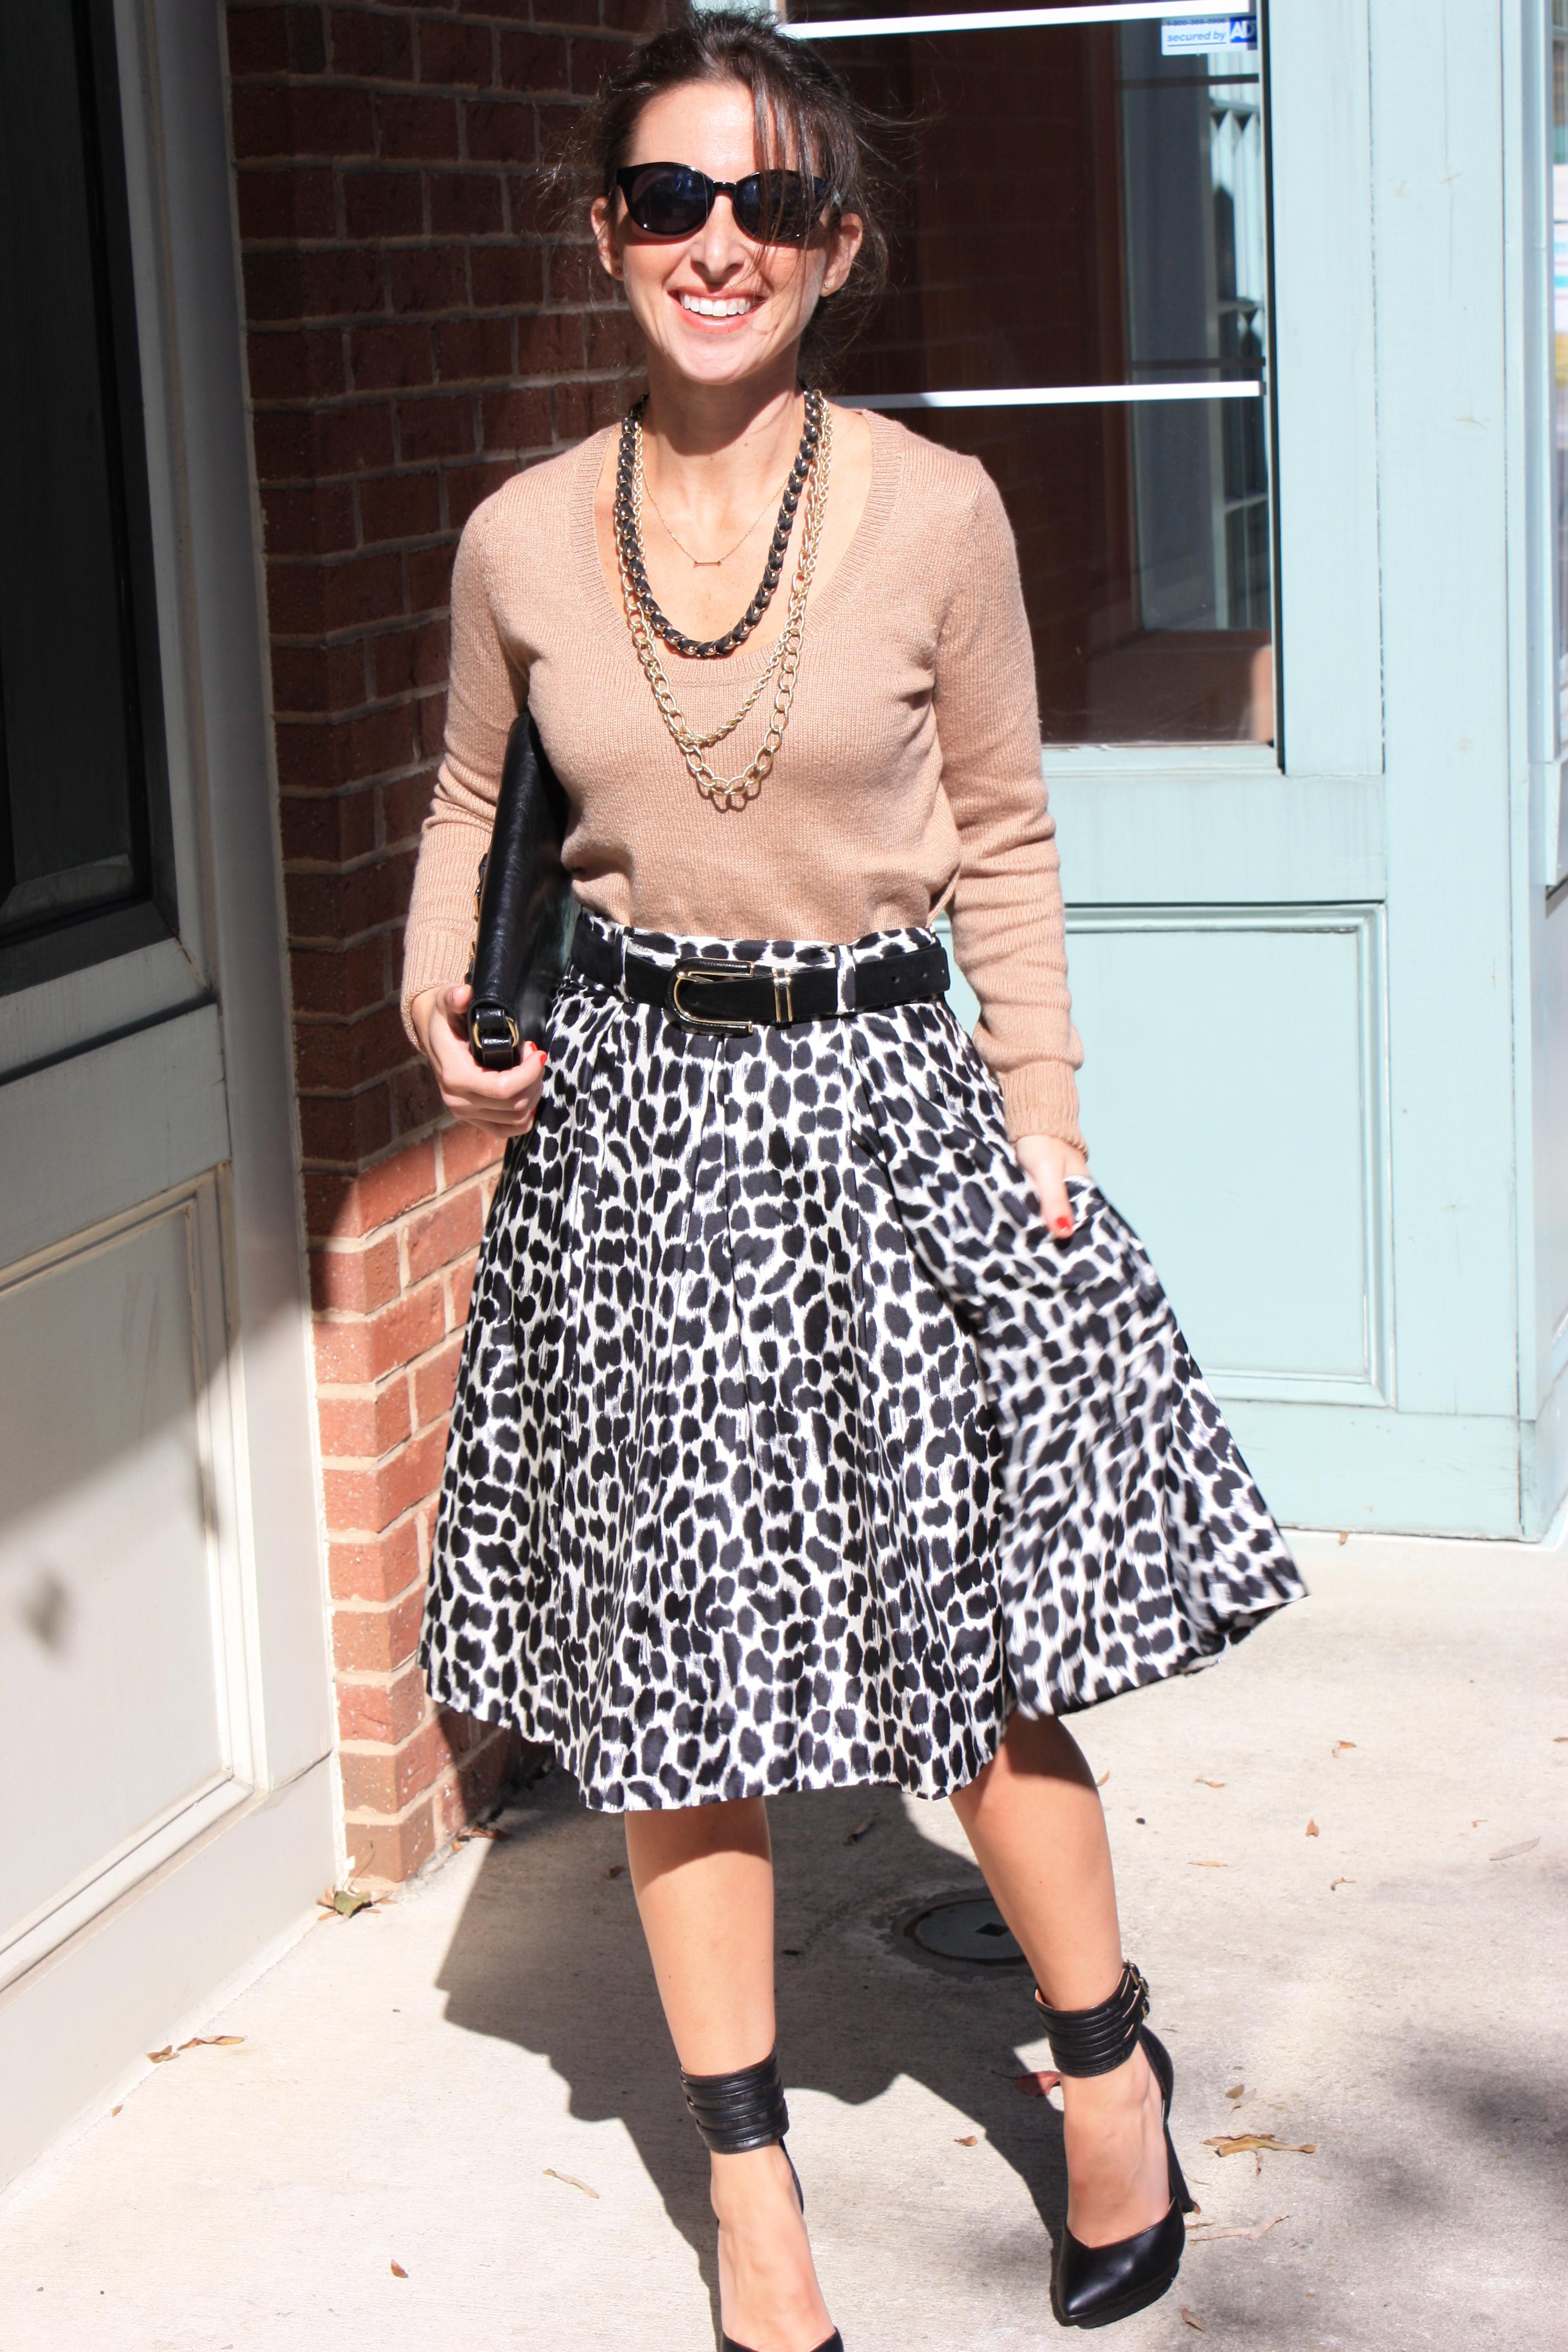 eb753a07bb2 Sweater  Old Navy   Skirt  Kate Spade via TJ Maxx (similar here)   Shoes   Colin Stuart via Victoria Secret (similar here)   Bag  Mango (similar here)  ...